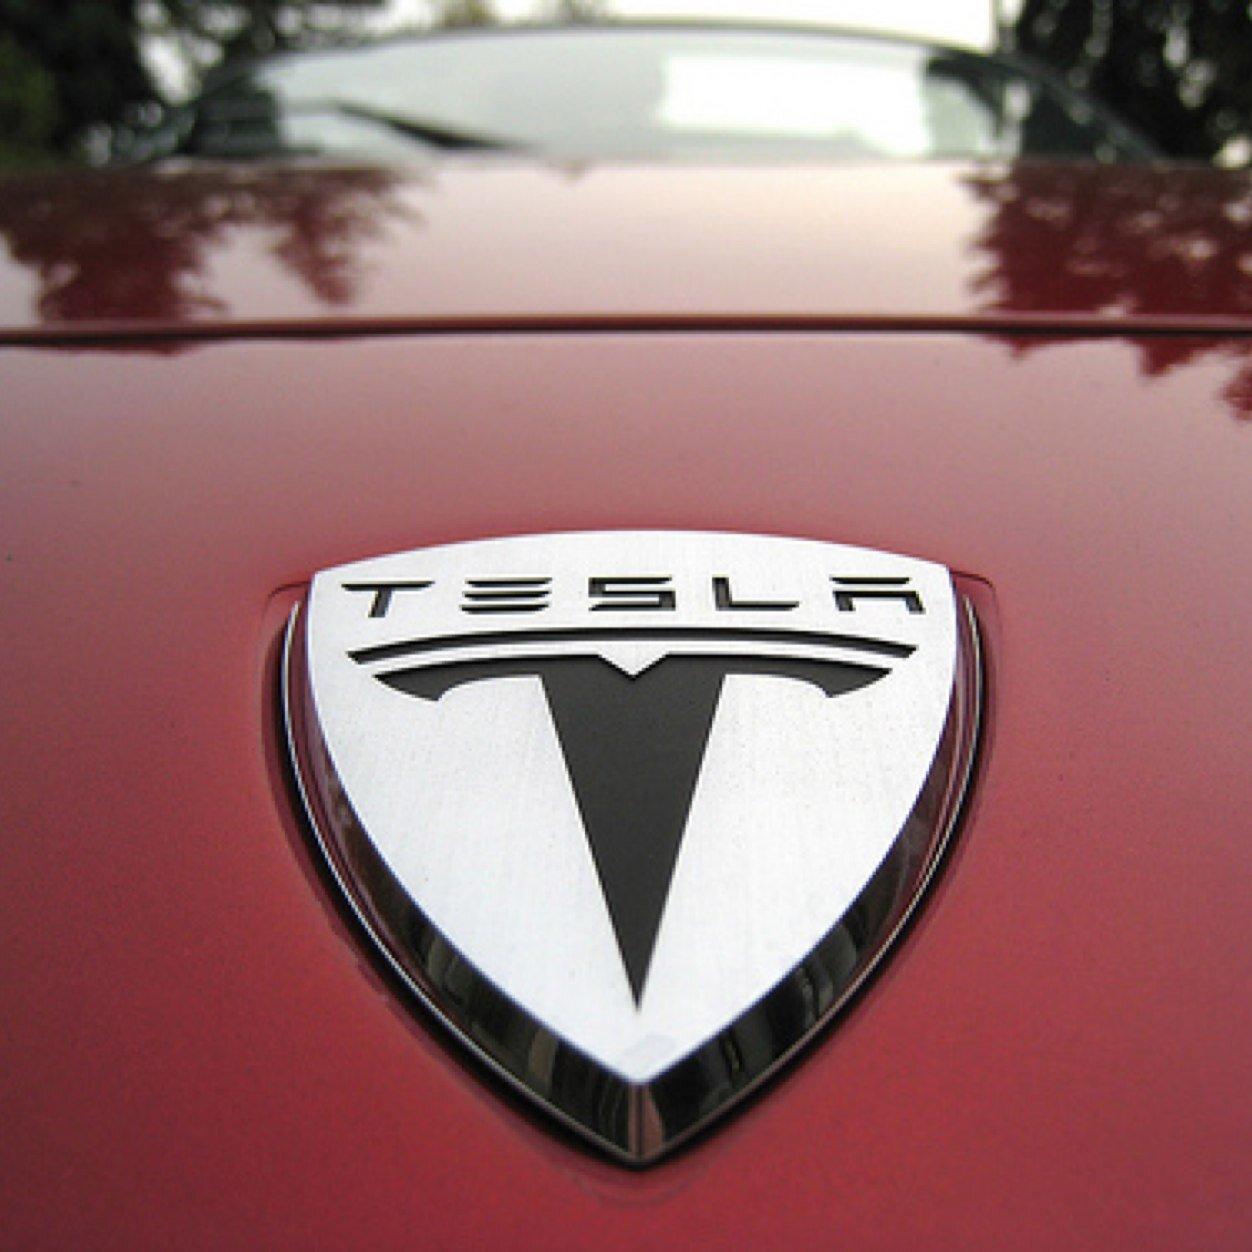 Tesla canada fans teslacanada twitter tesla canada fans biocorpaavc